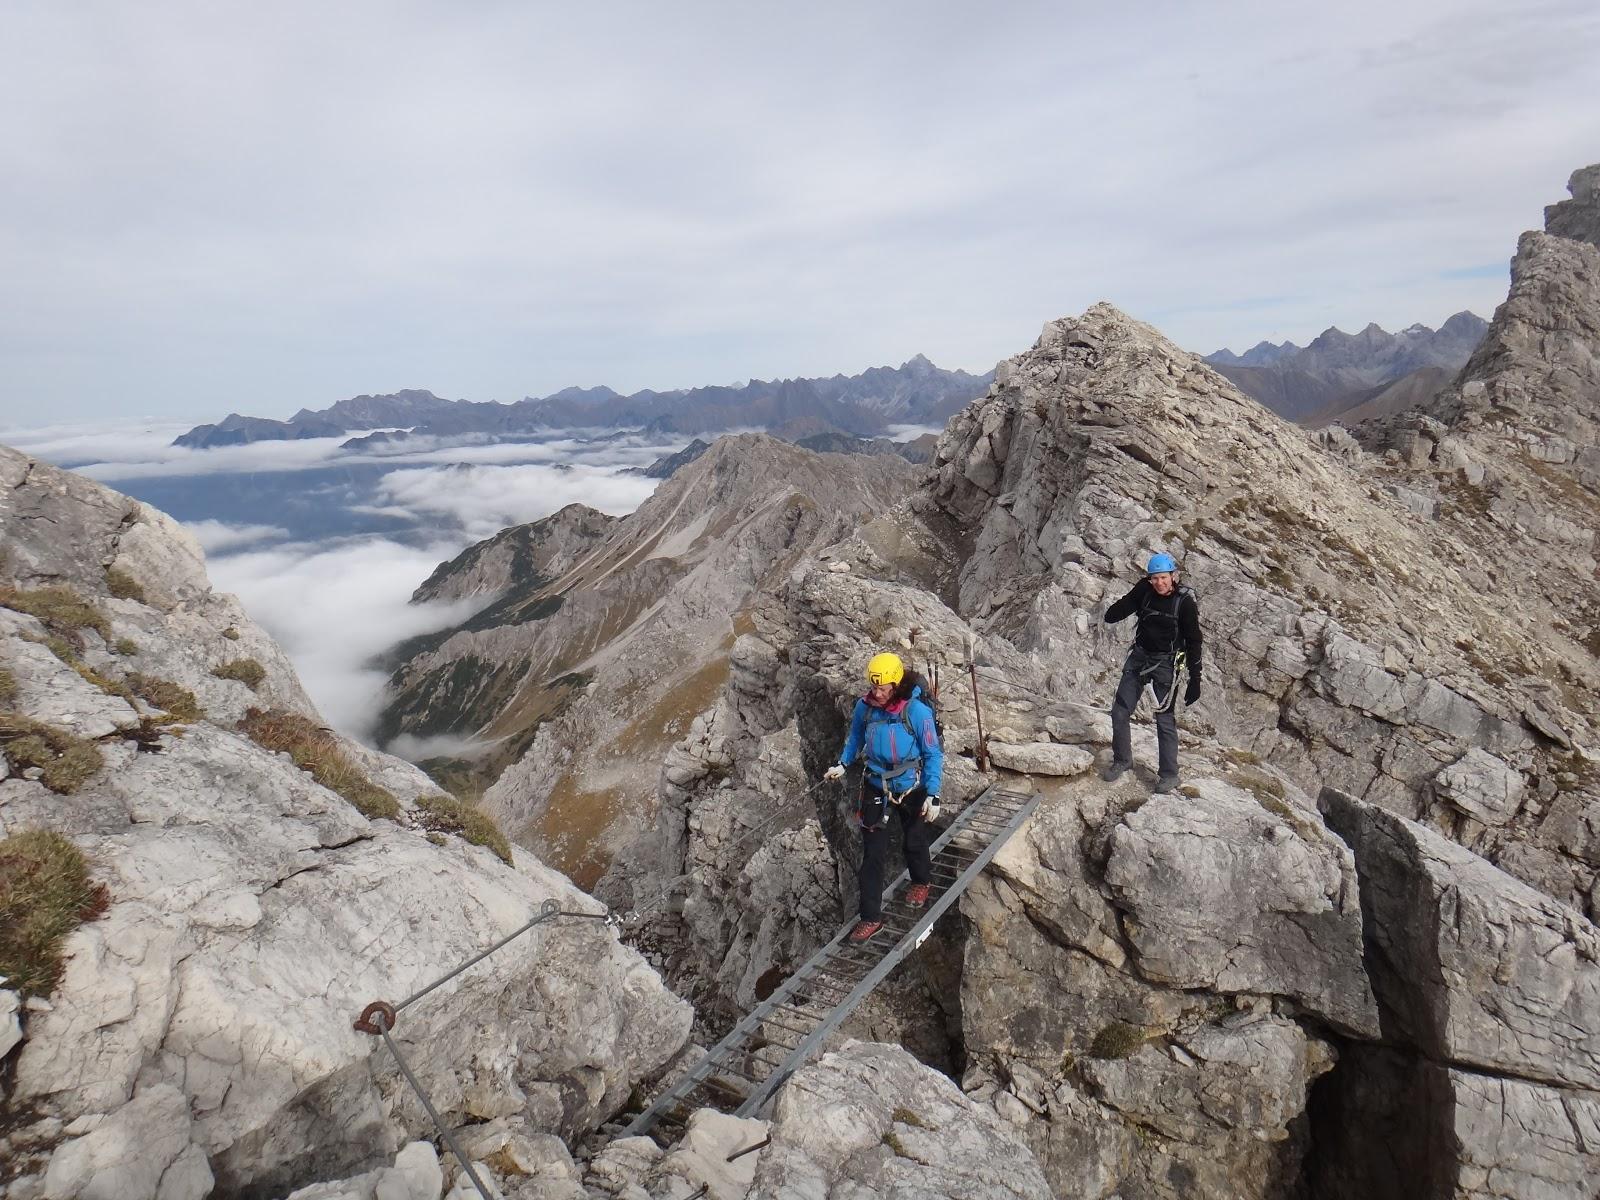 Klettersteig Mindelheimer : Gipfeljagd klettersteig mindelheimer schafalpenkopf